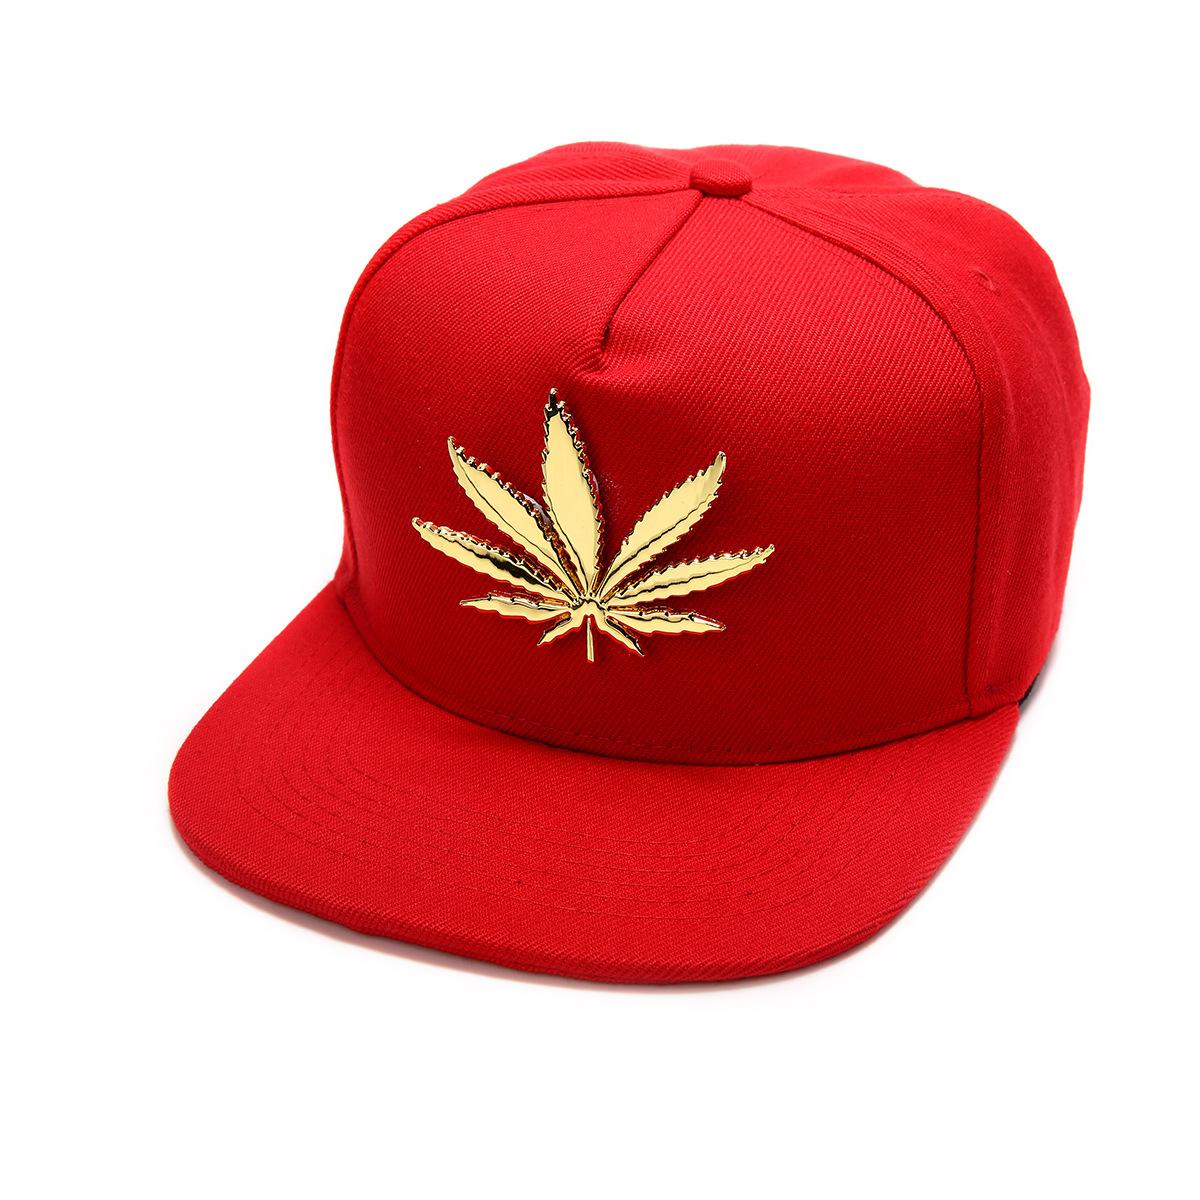 Apparel - Weed Cotton Hip Hop Cap